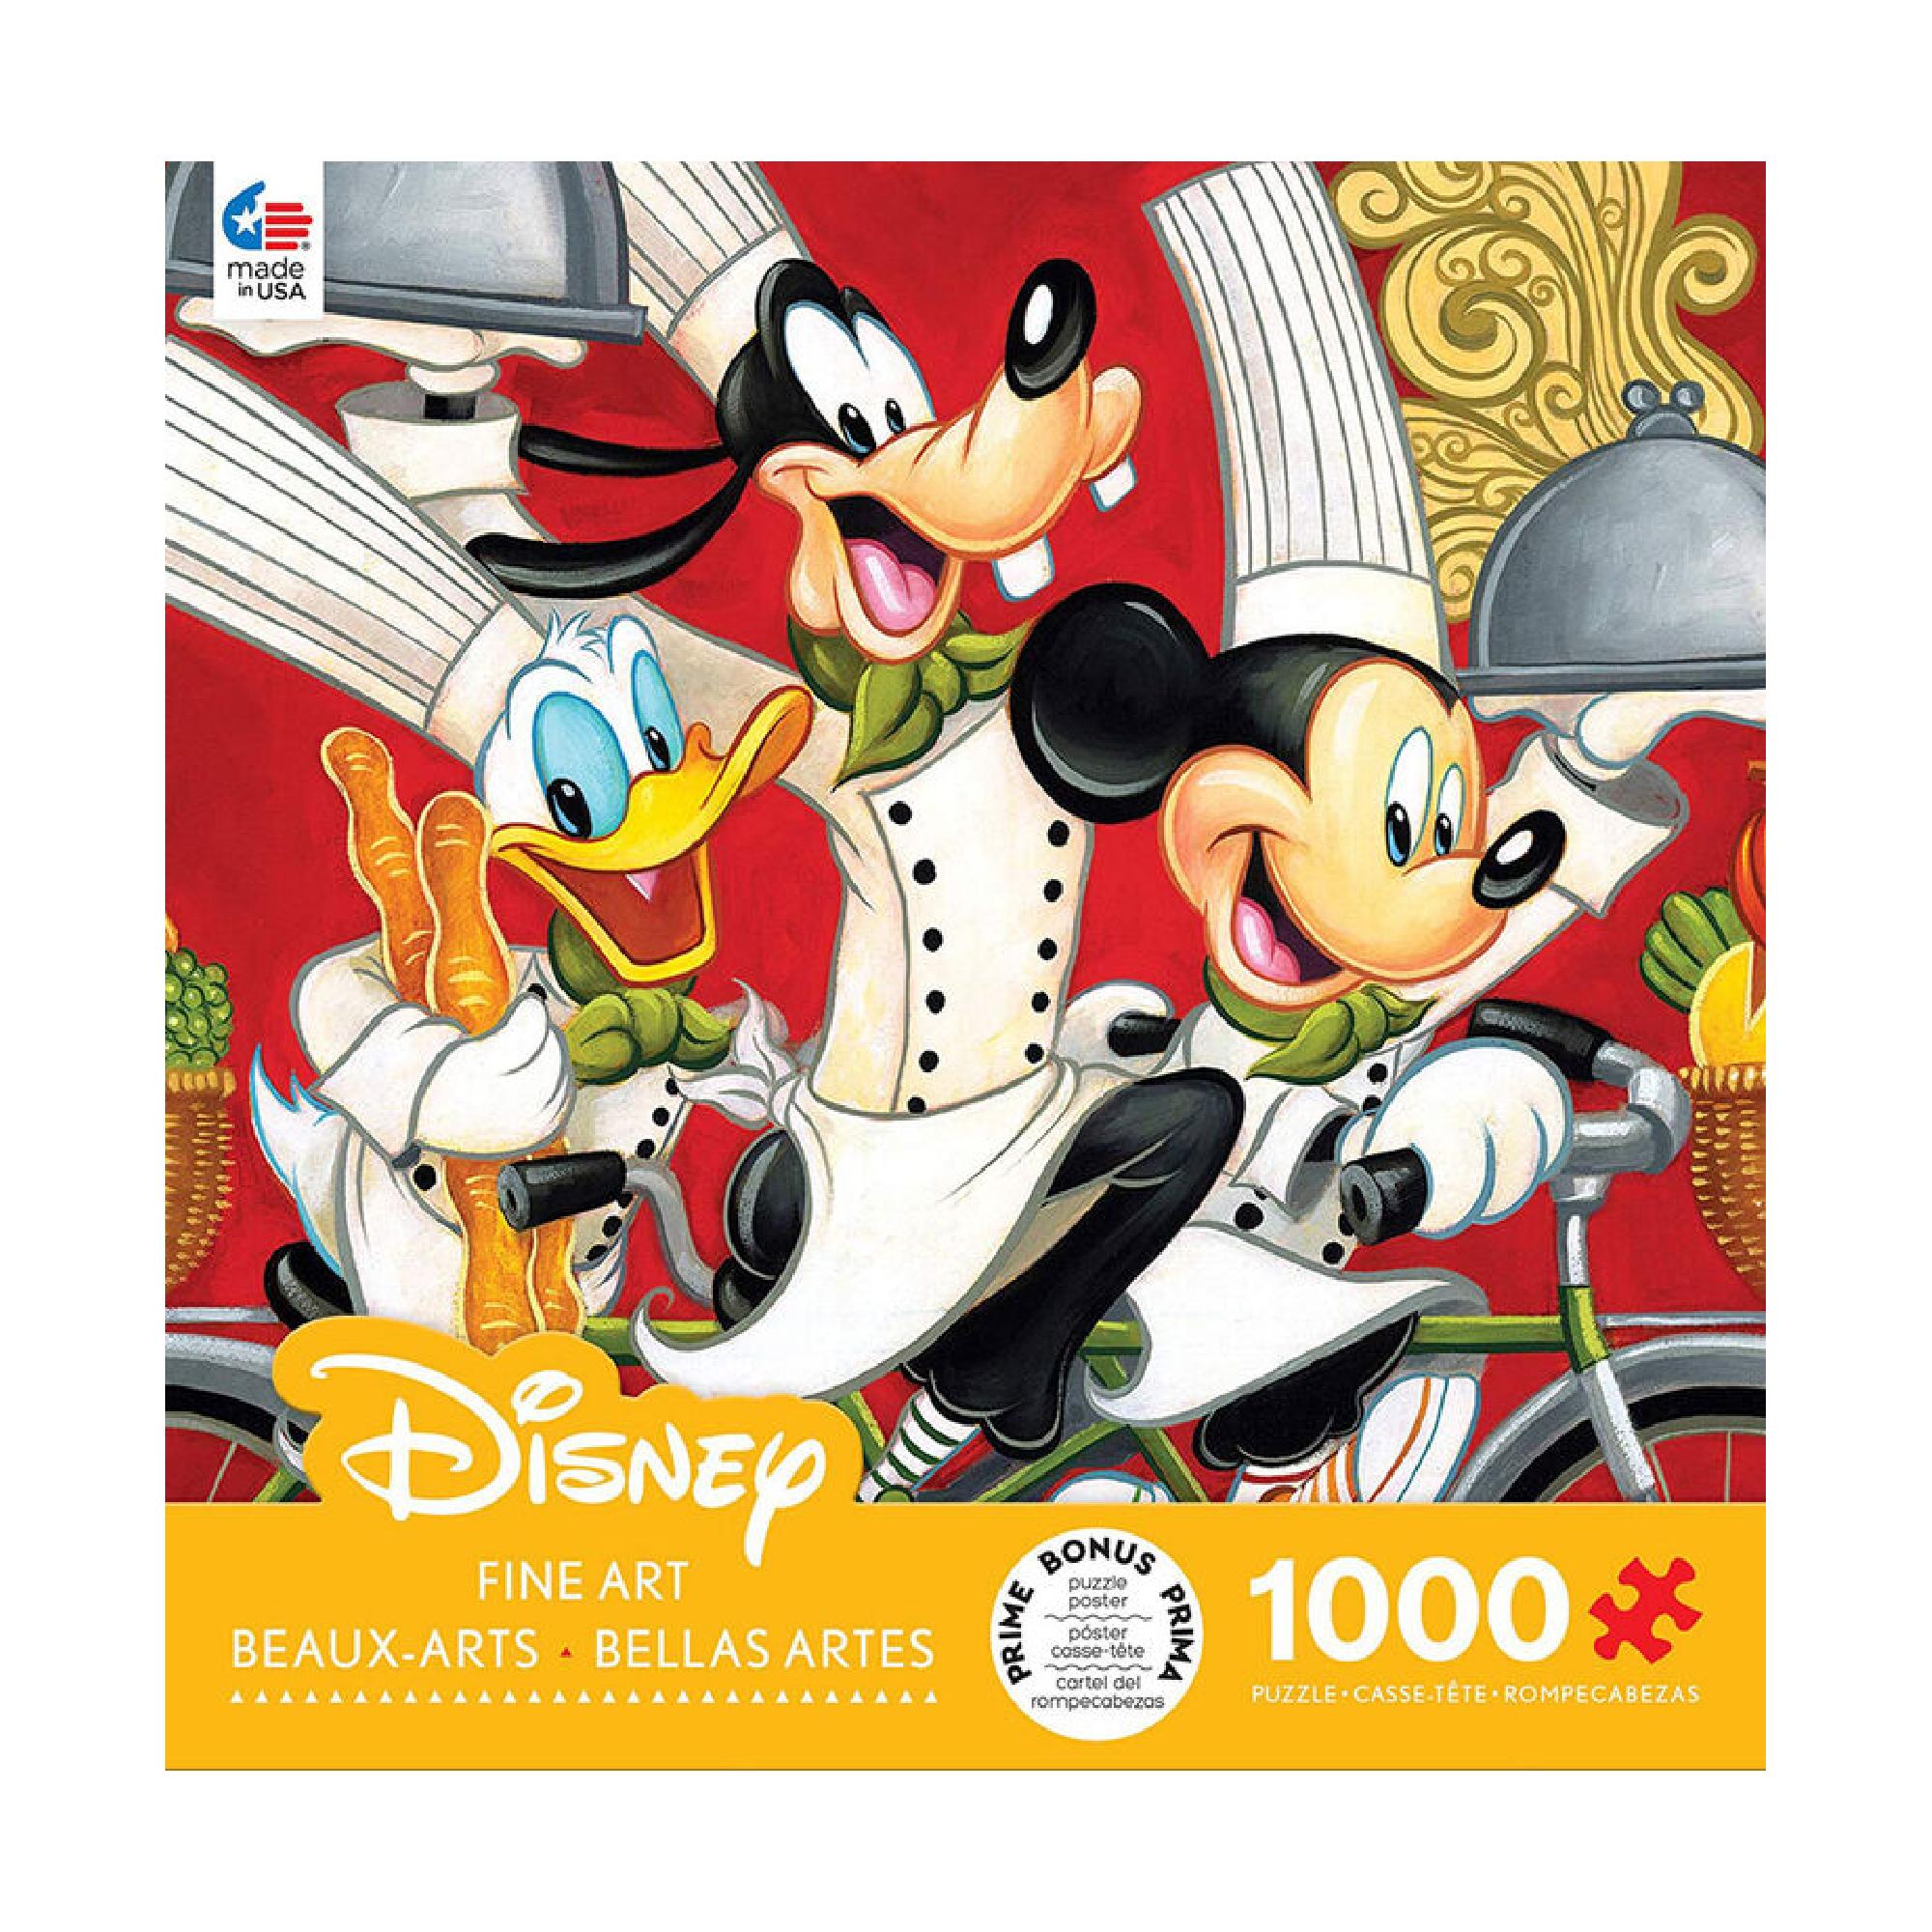 Ceaco Puzzle 1000: Disney Fine Art, Wheeling in Flavour